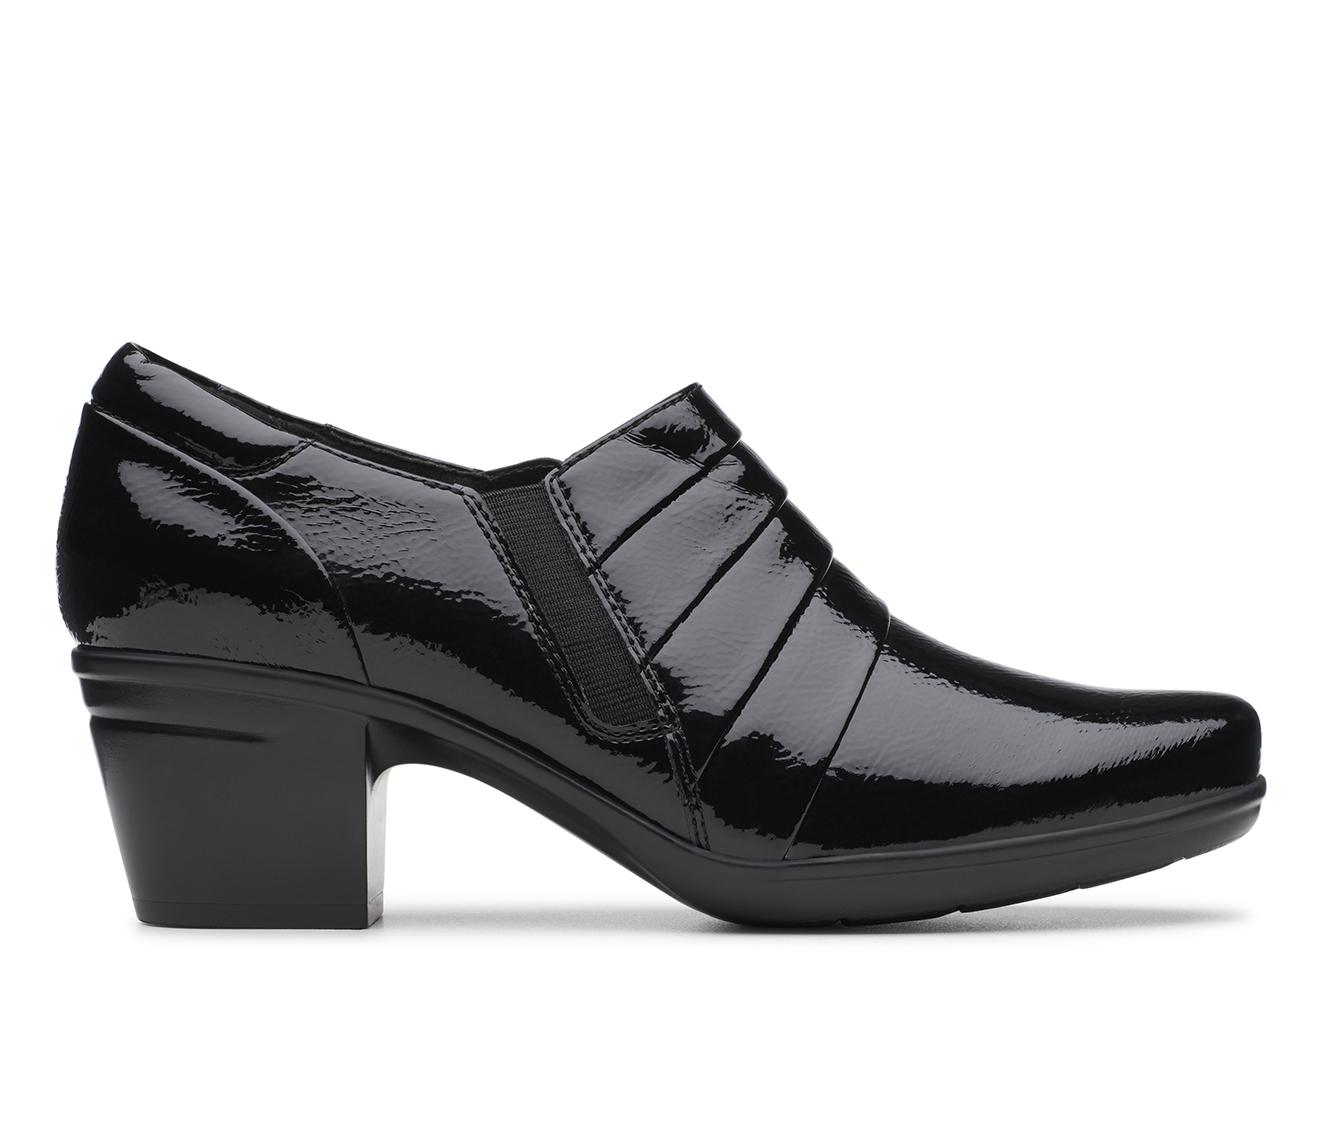 Clarks Emslie Guide Women's Shoe (Black Faux Leather)